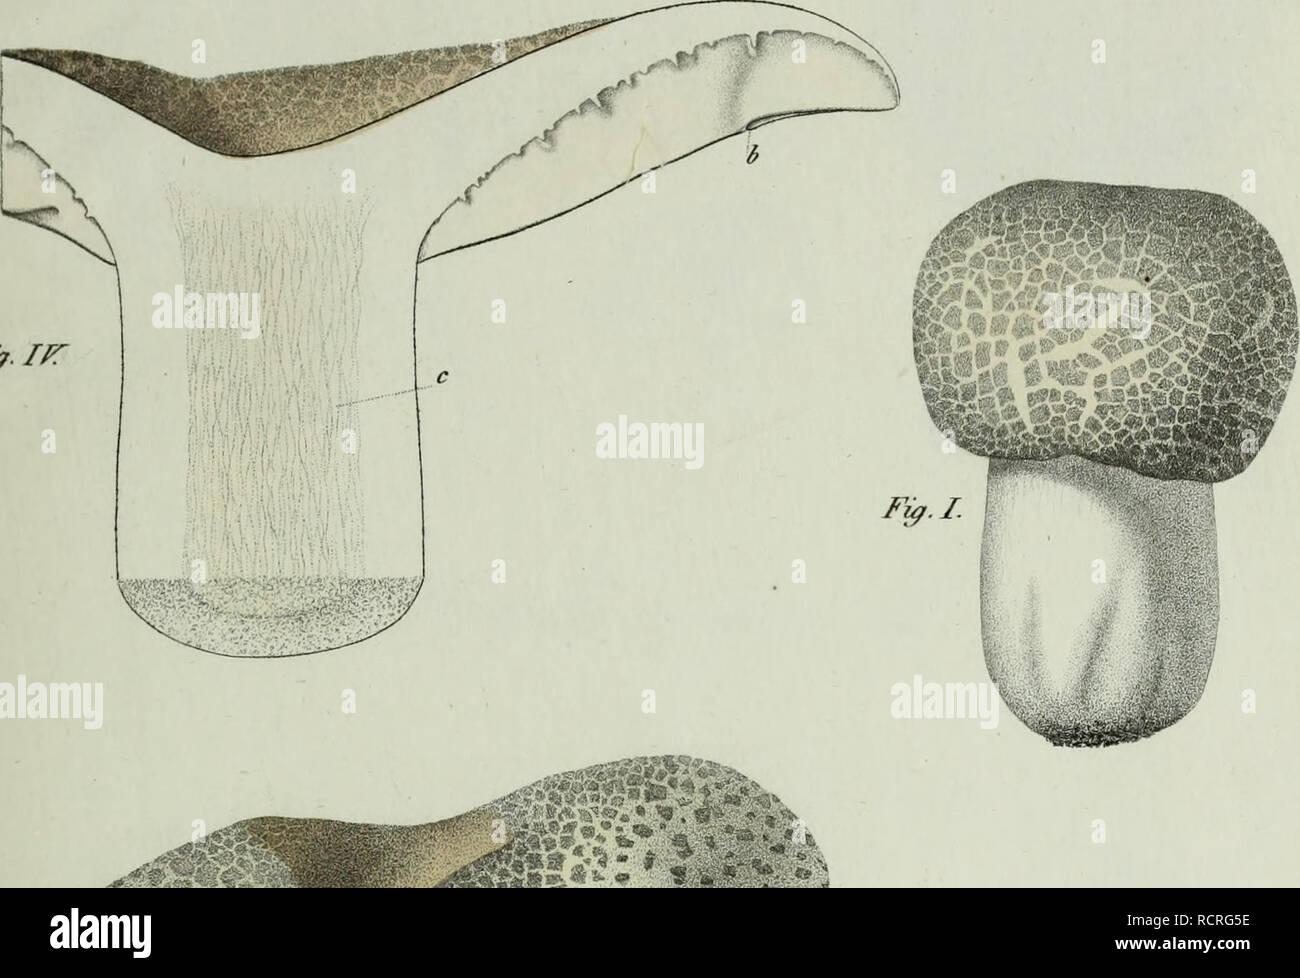 . Descrizione dei funghi mangerecci più comuni dell'Italia e de' velenosi che possono co' medesimi confondersi. Fungi; Mushrooms. Txxxi Fy.IPT. m&5 ^ *-*. - ag flfflfl v#'/ Fi9.n1.. Please note that these images are extracted from scanned page images that may have been digitally enhanced for readability - coloration and appearance of these illustrations may not perfectly resemble the original work.. Vittadini, Carlo; Cavagna Sangiuliani di Gualdana, Antonio, conte, 1843-1913, former owner. IU-R. Milano, Rusconi - Stock Image